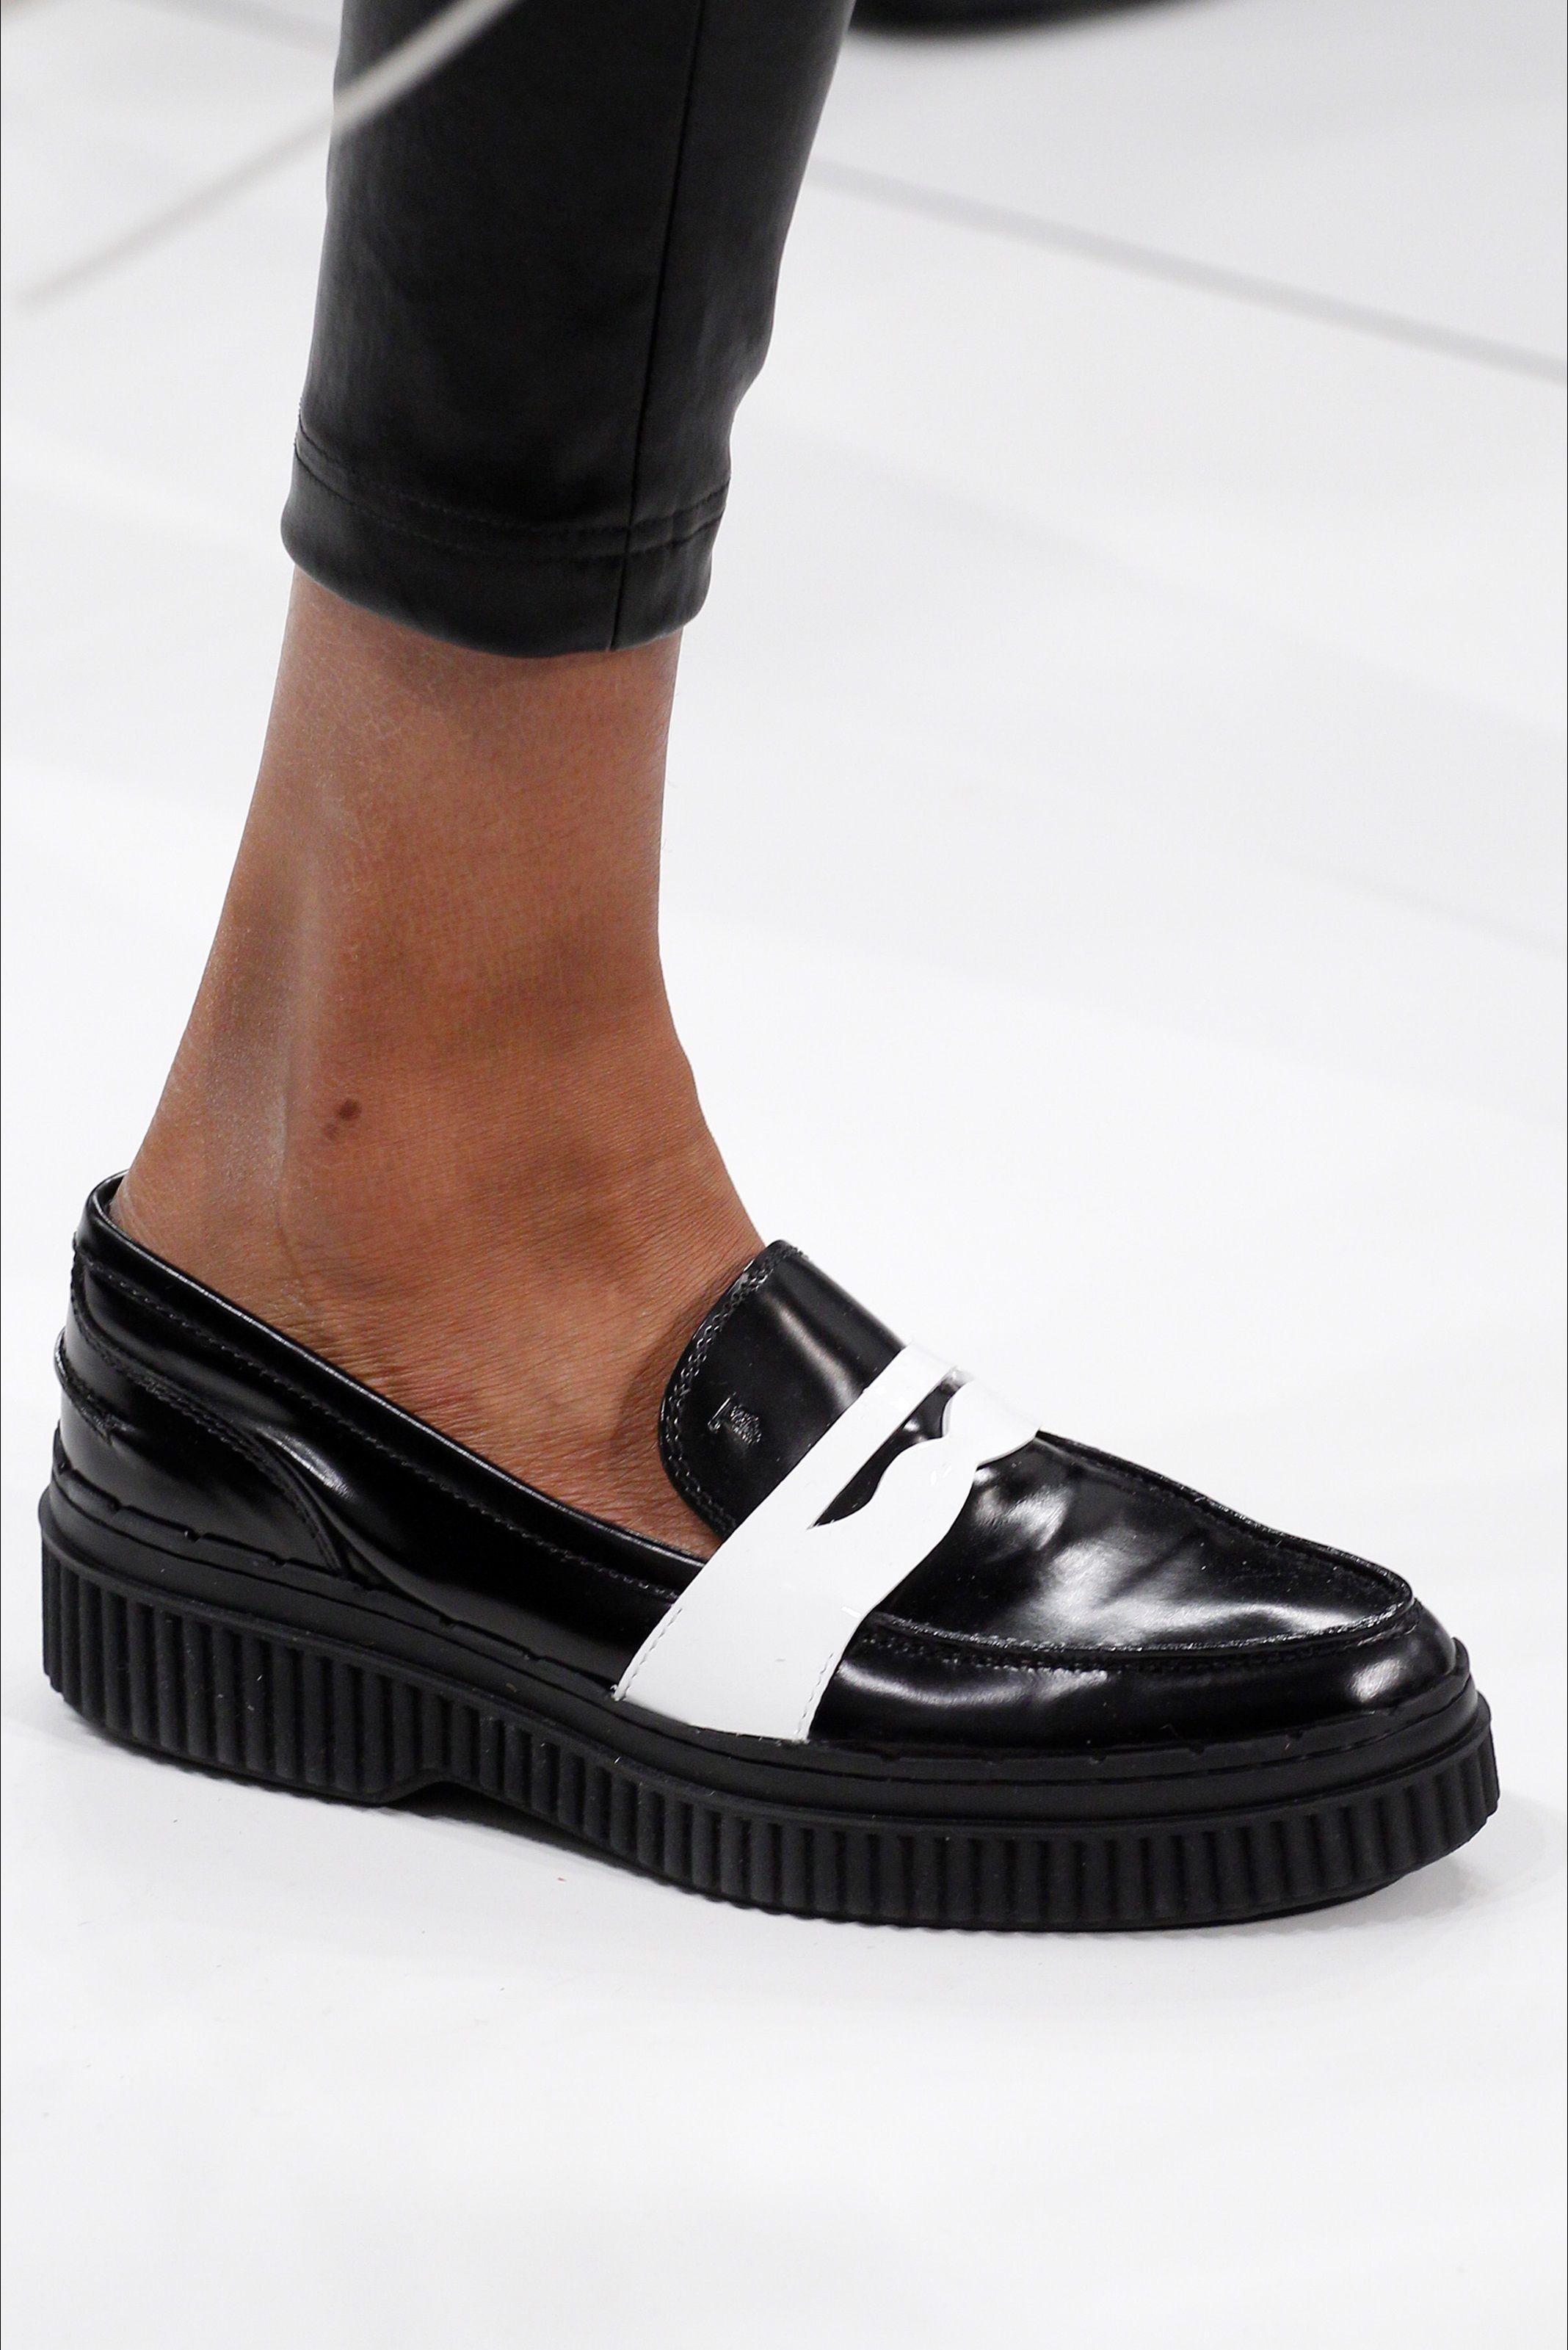 FOOTWEAR - Sandals Milano Collezioni NRvRUFu3vi